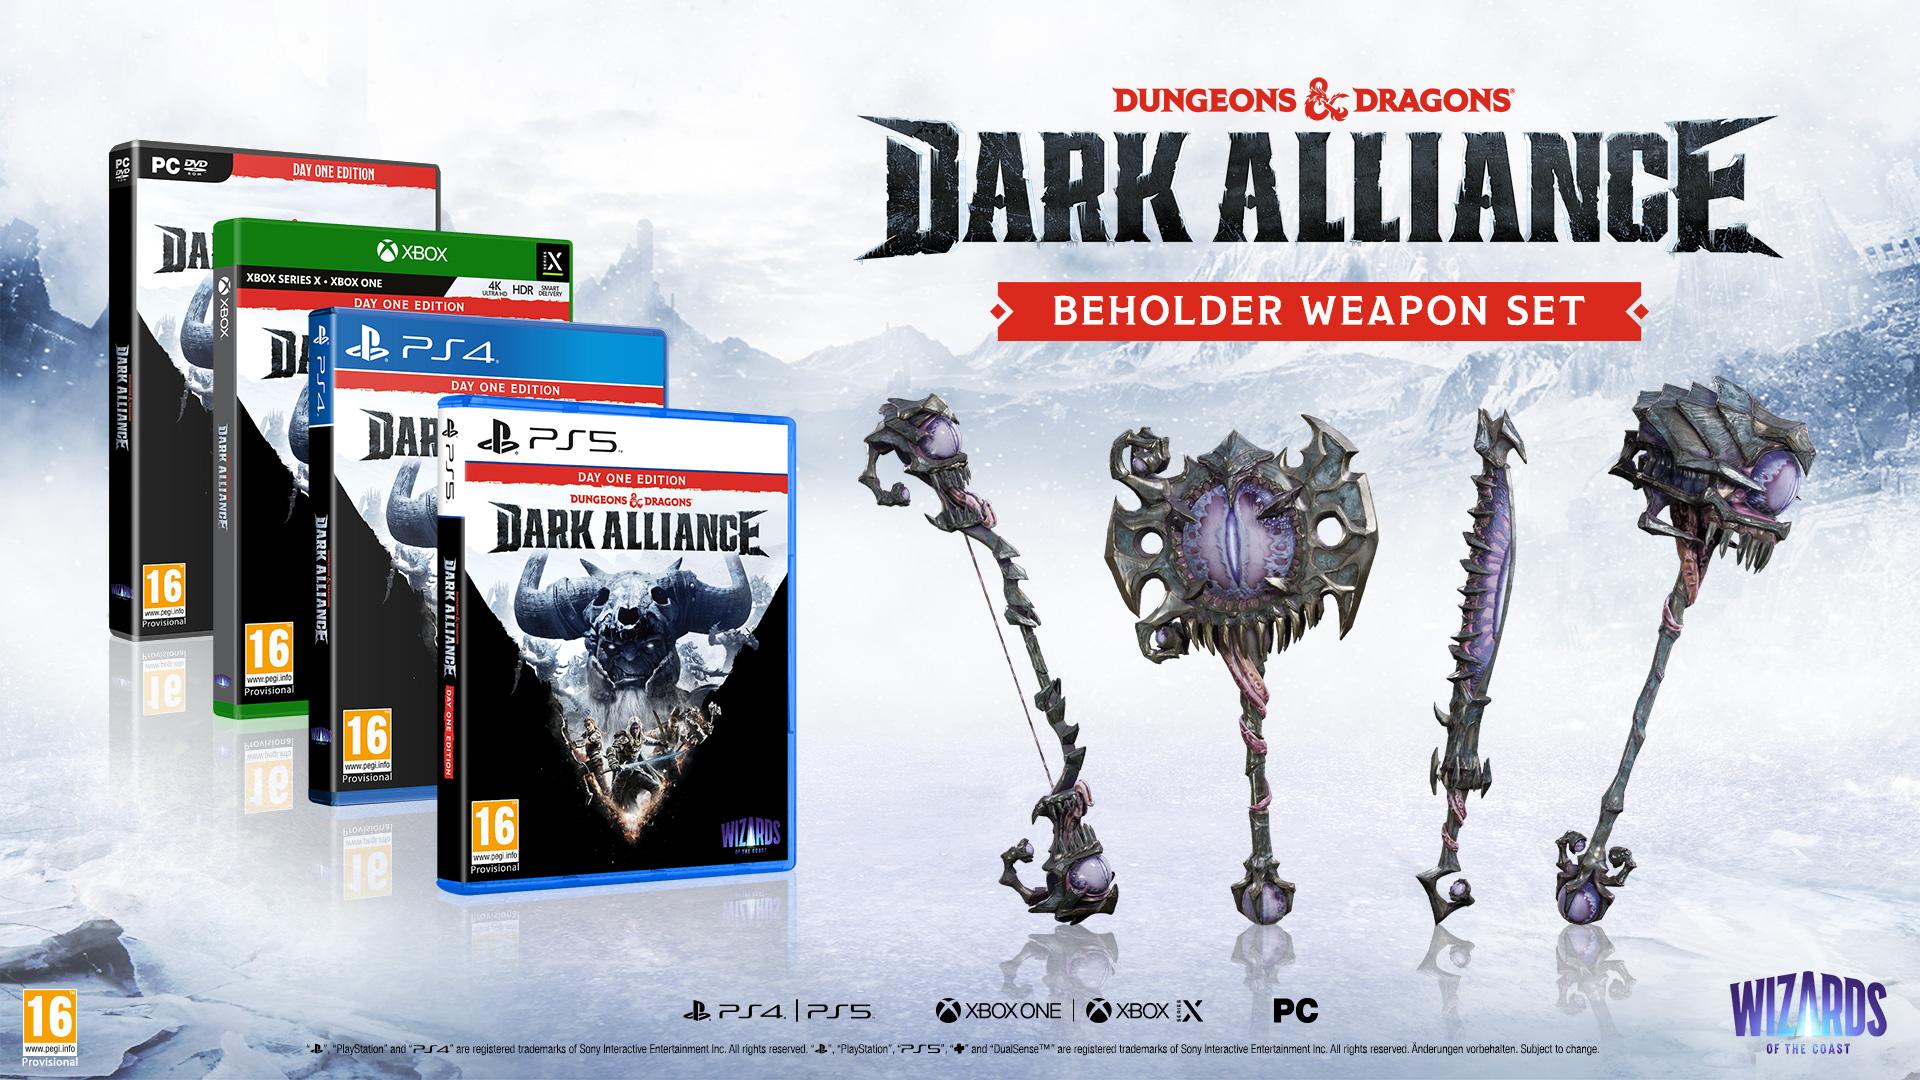 Dungeons & Dragons: Dark Alliance Day One Editiion